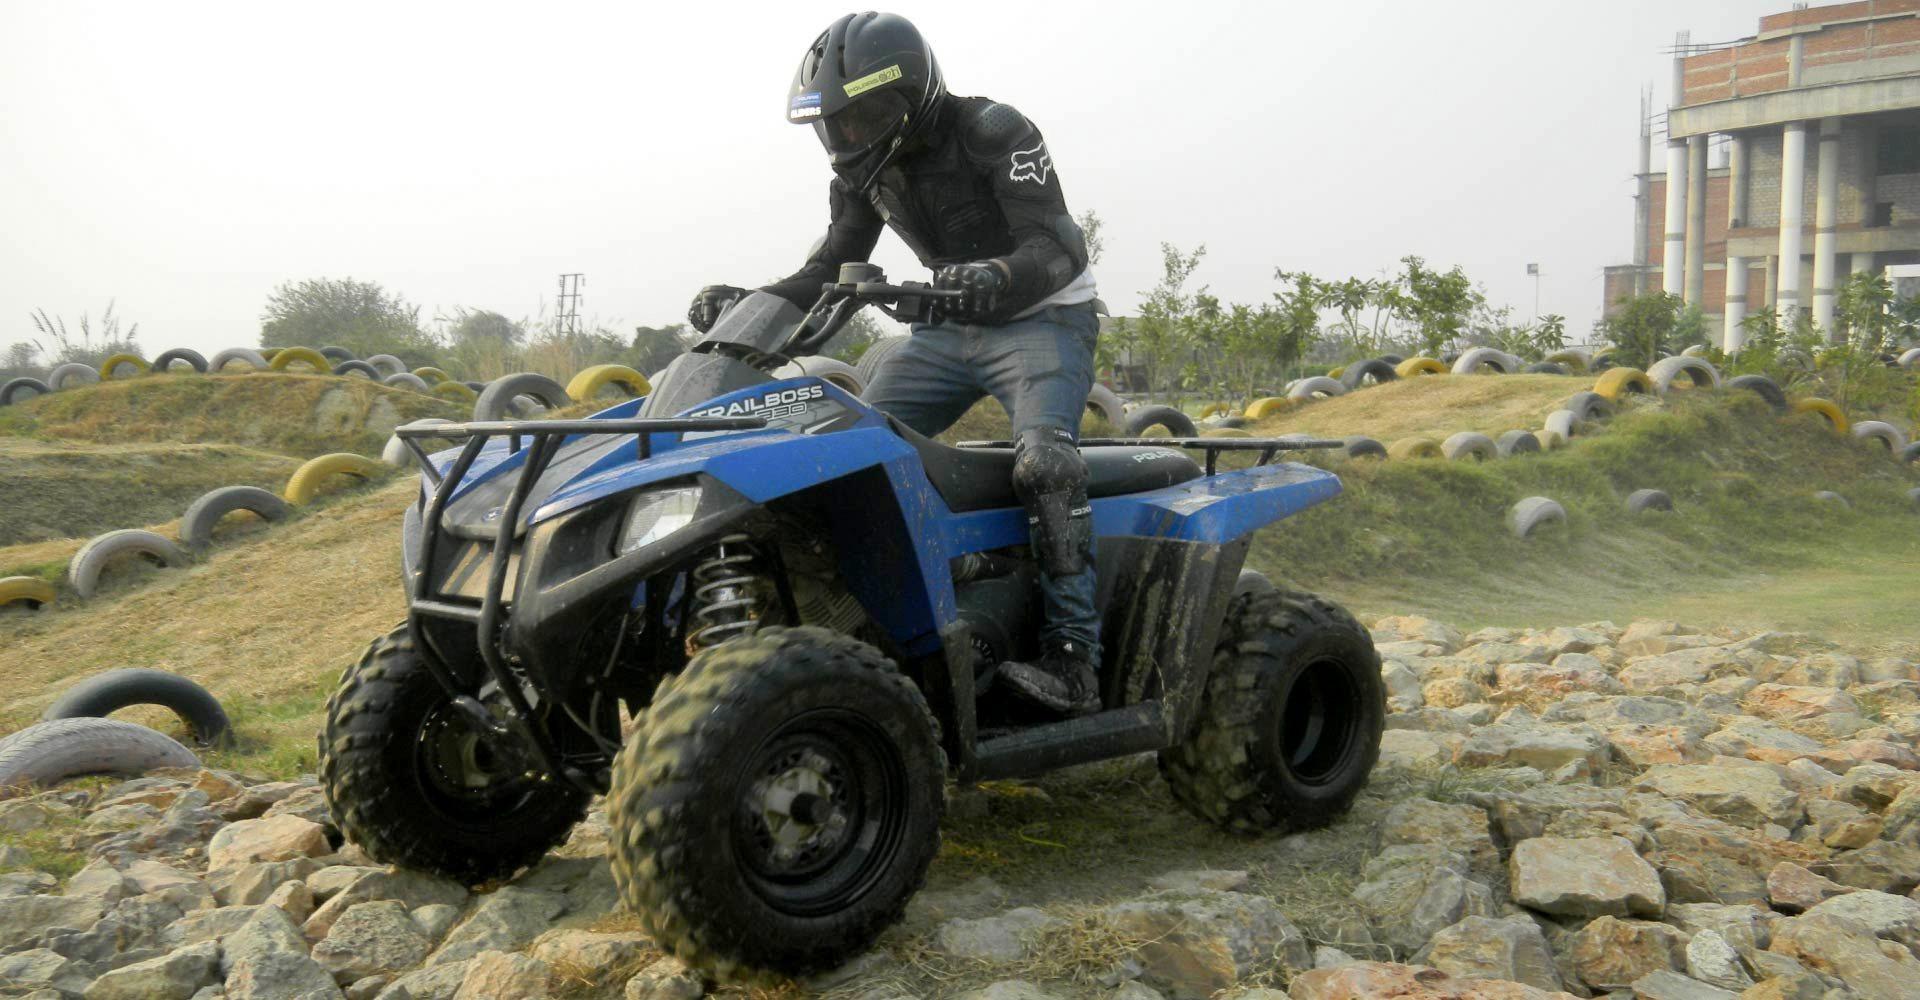 ATV Setup In India